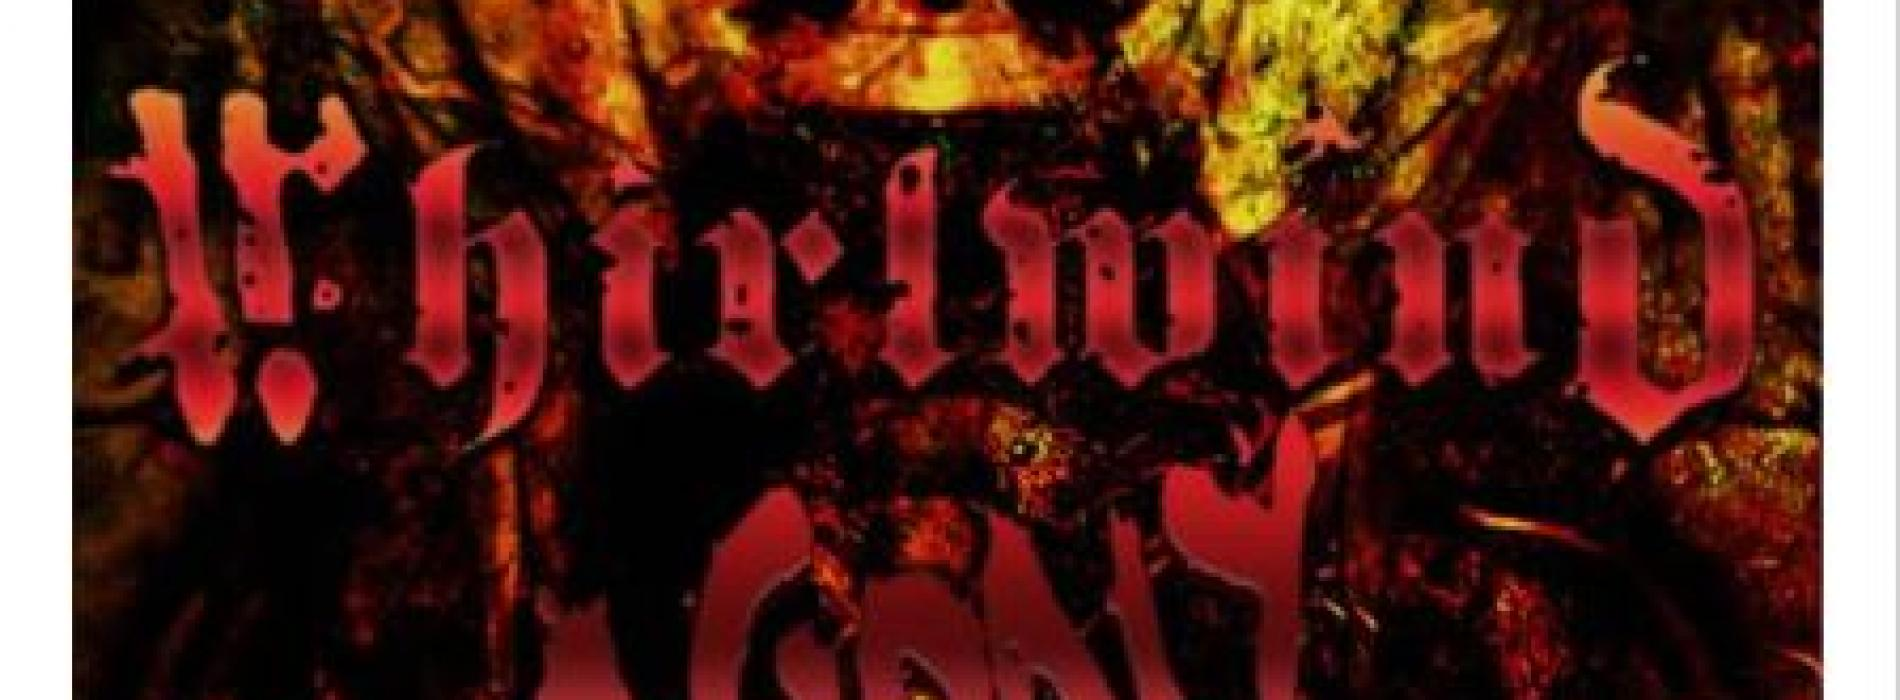 Whirlwind – Agony (The Album)